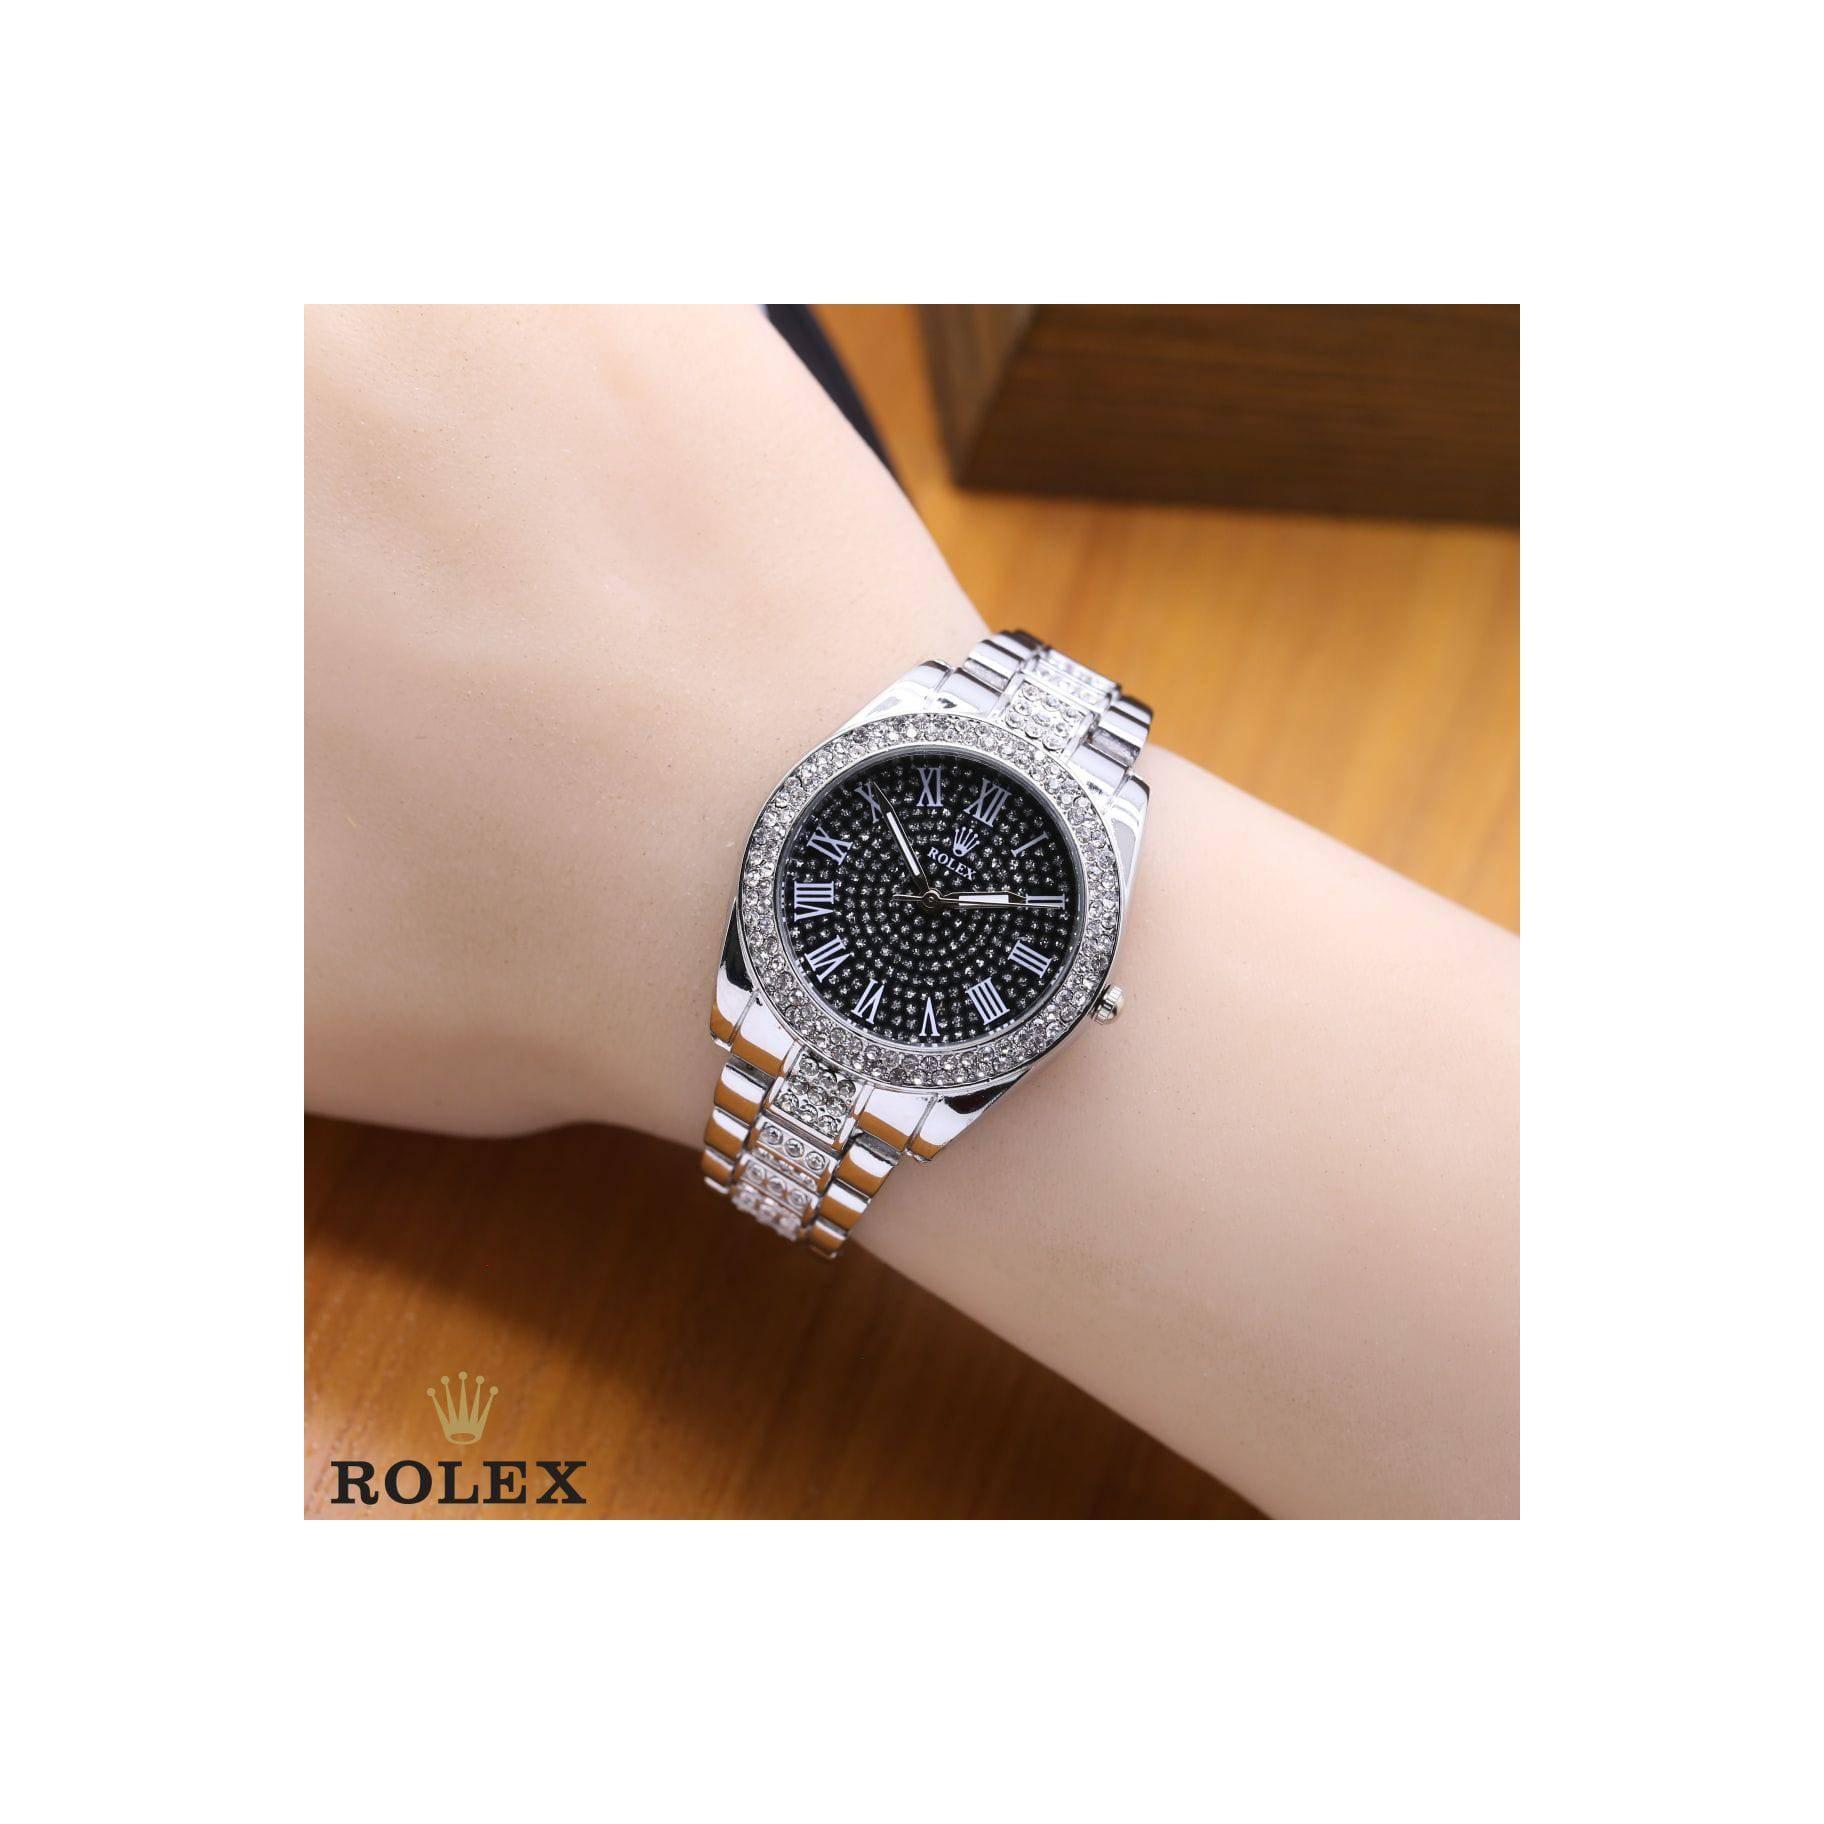 jam tangan ROLEX WANITA ANGKA ROMAWI RANTAI